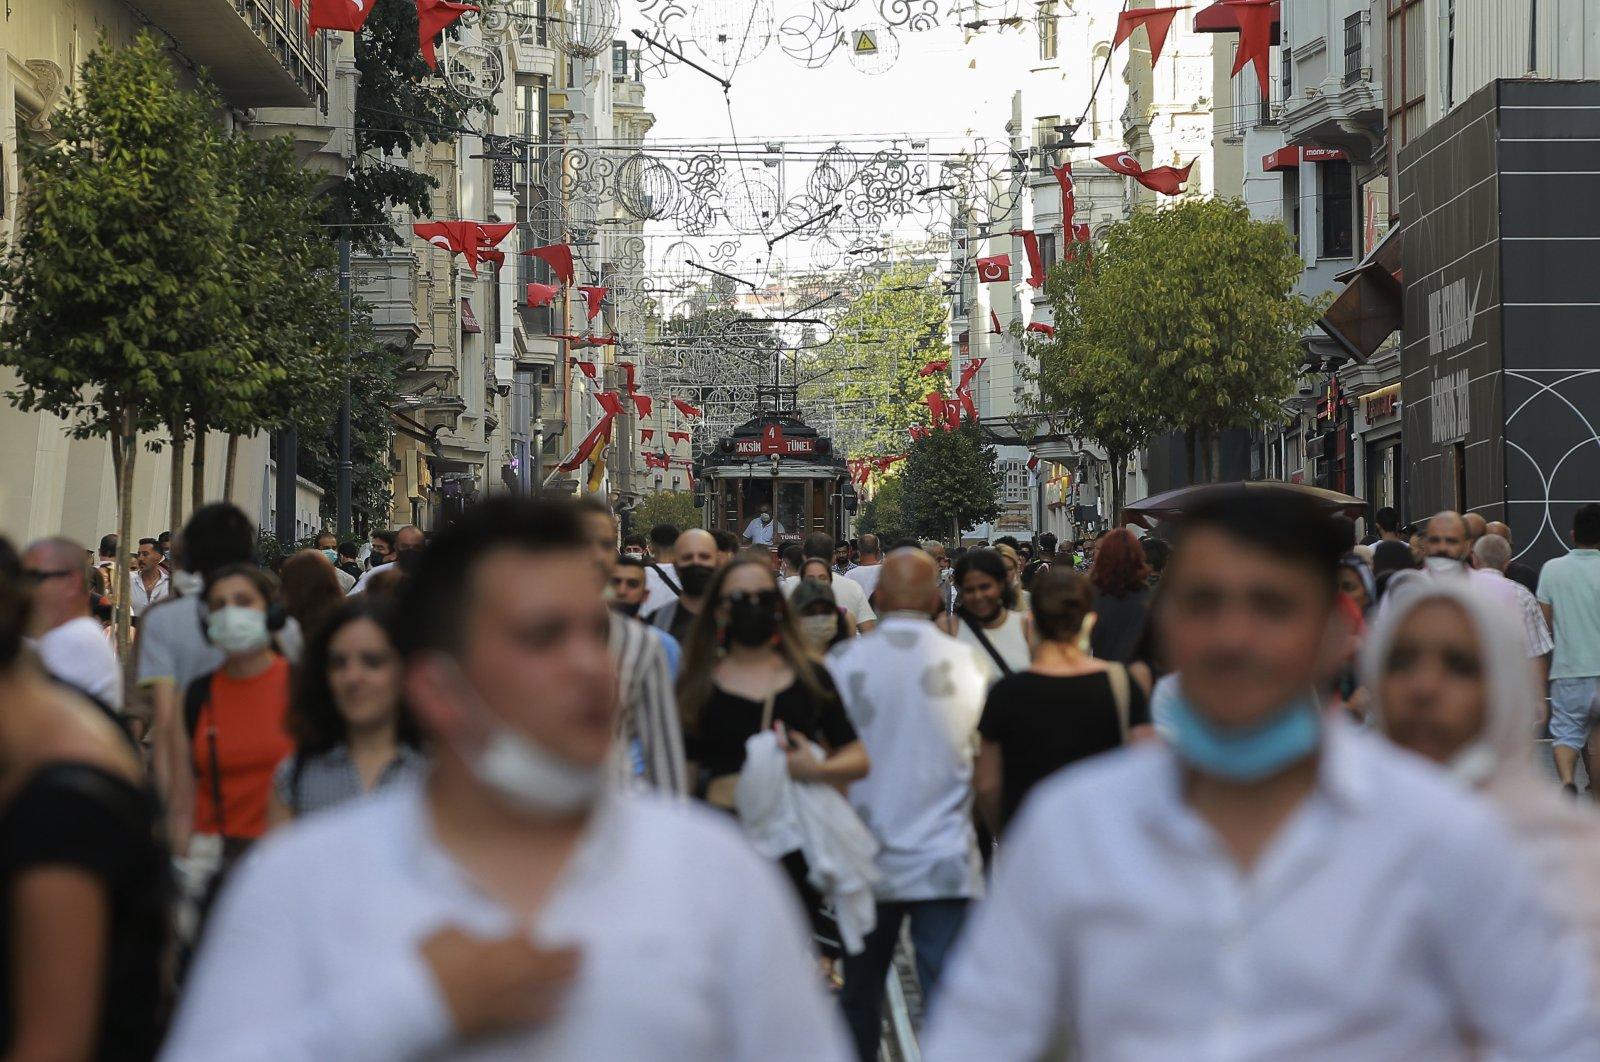 People walk along Istiklal Street, the main shopping street in Istanbul, Turkey, July 27, 2021. (AP Photo)